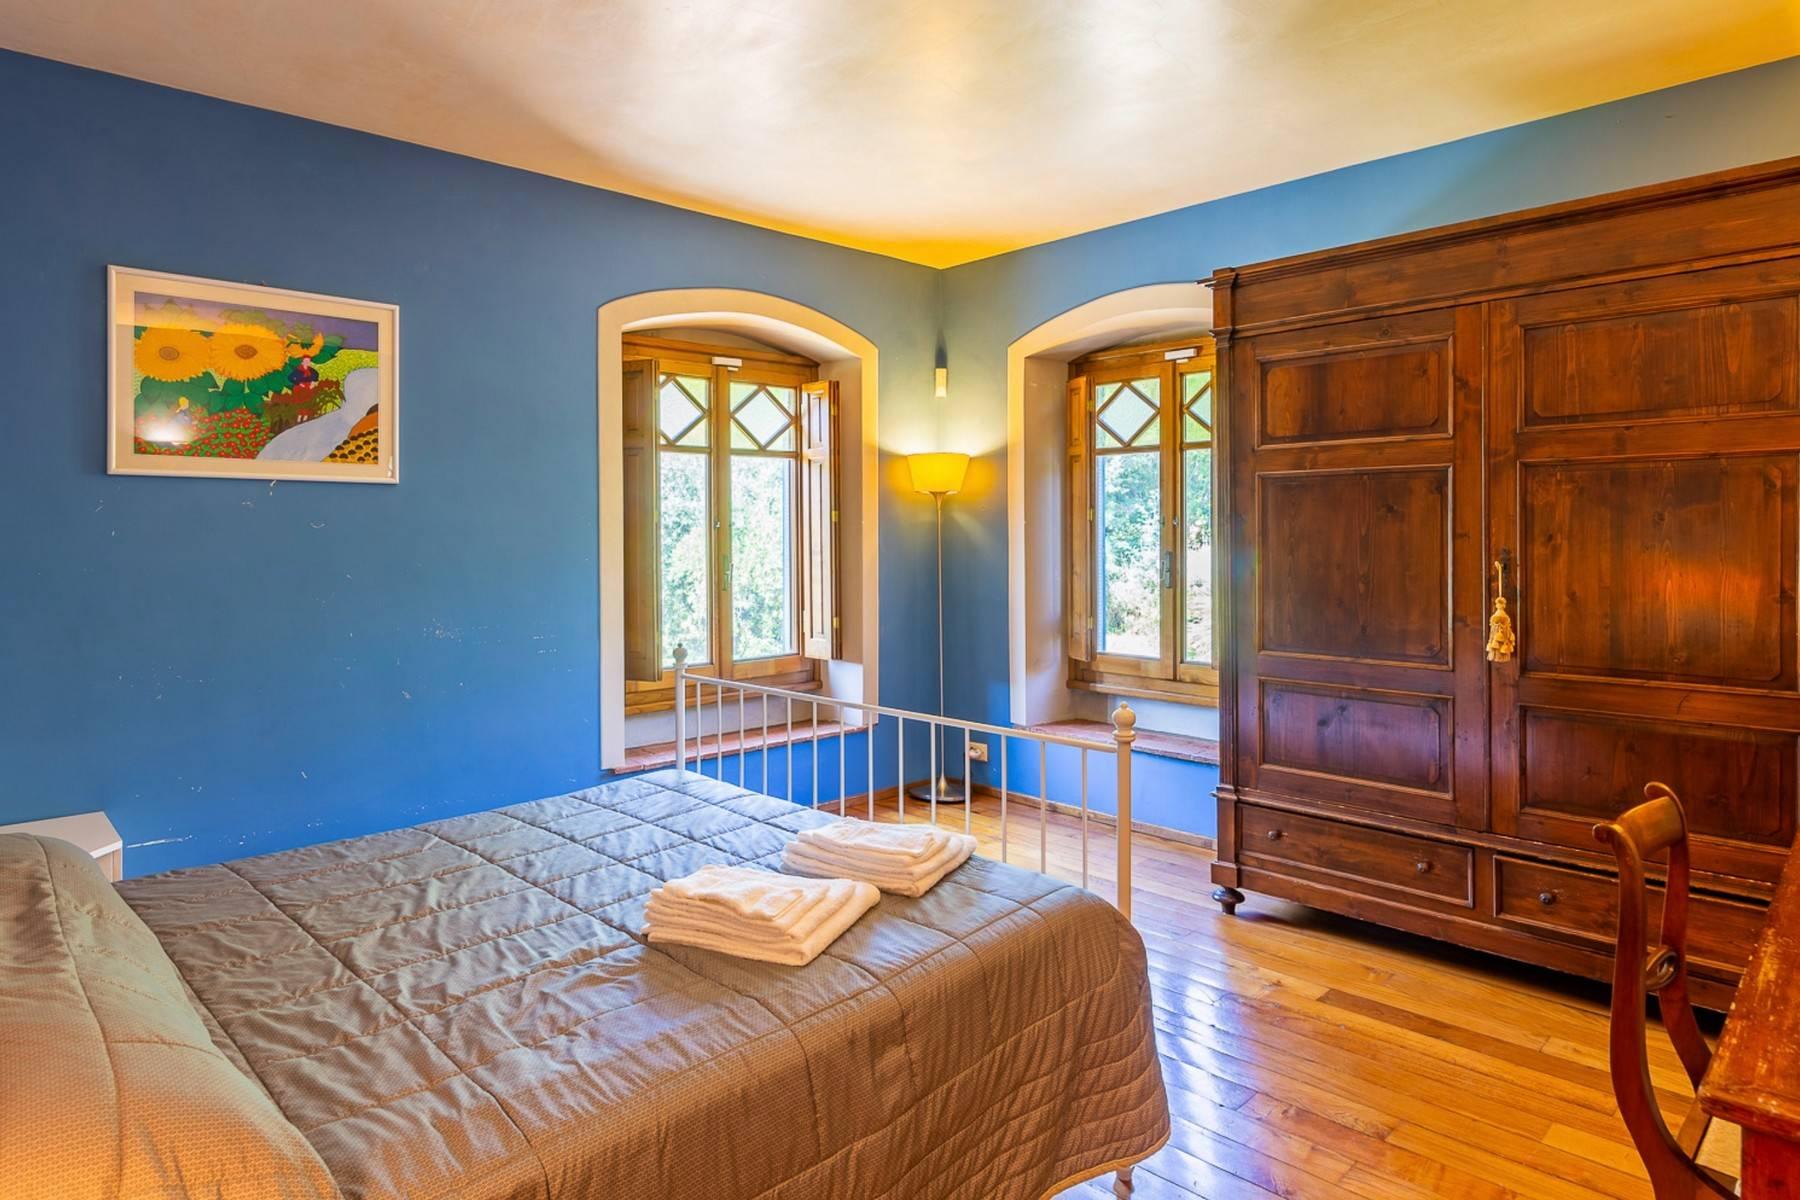 Villa in Vendita a Lucca: 5 locali, 1130 mq - Foto 15